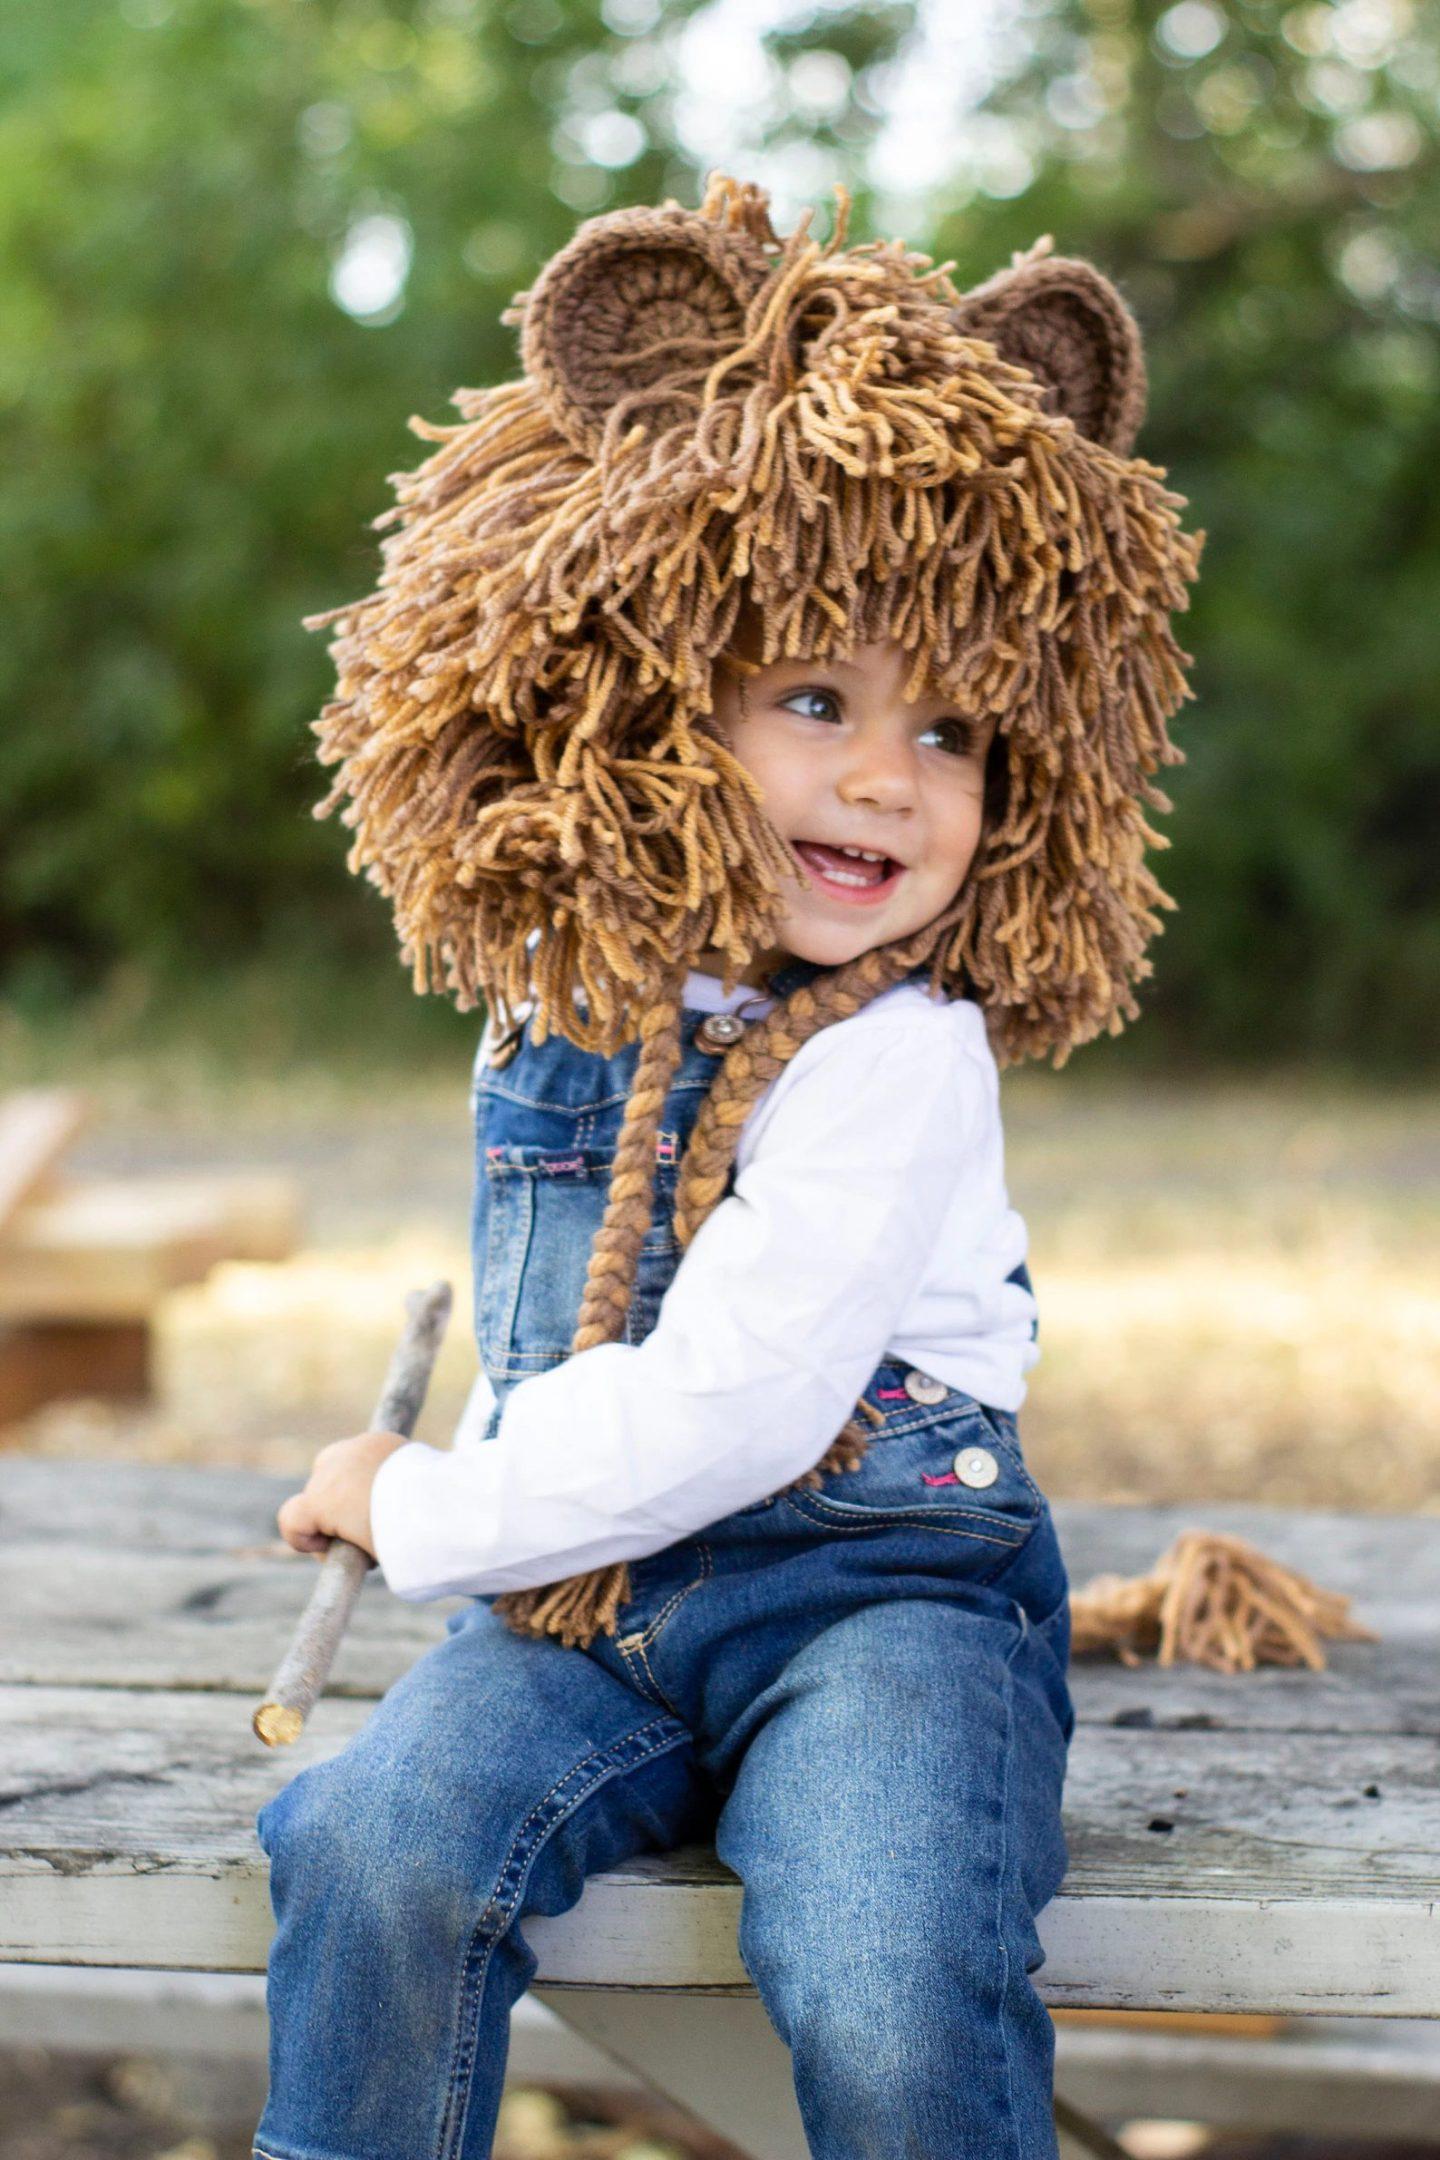 Toddler lion Halloween costume